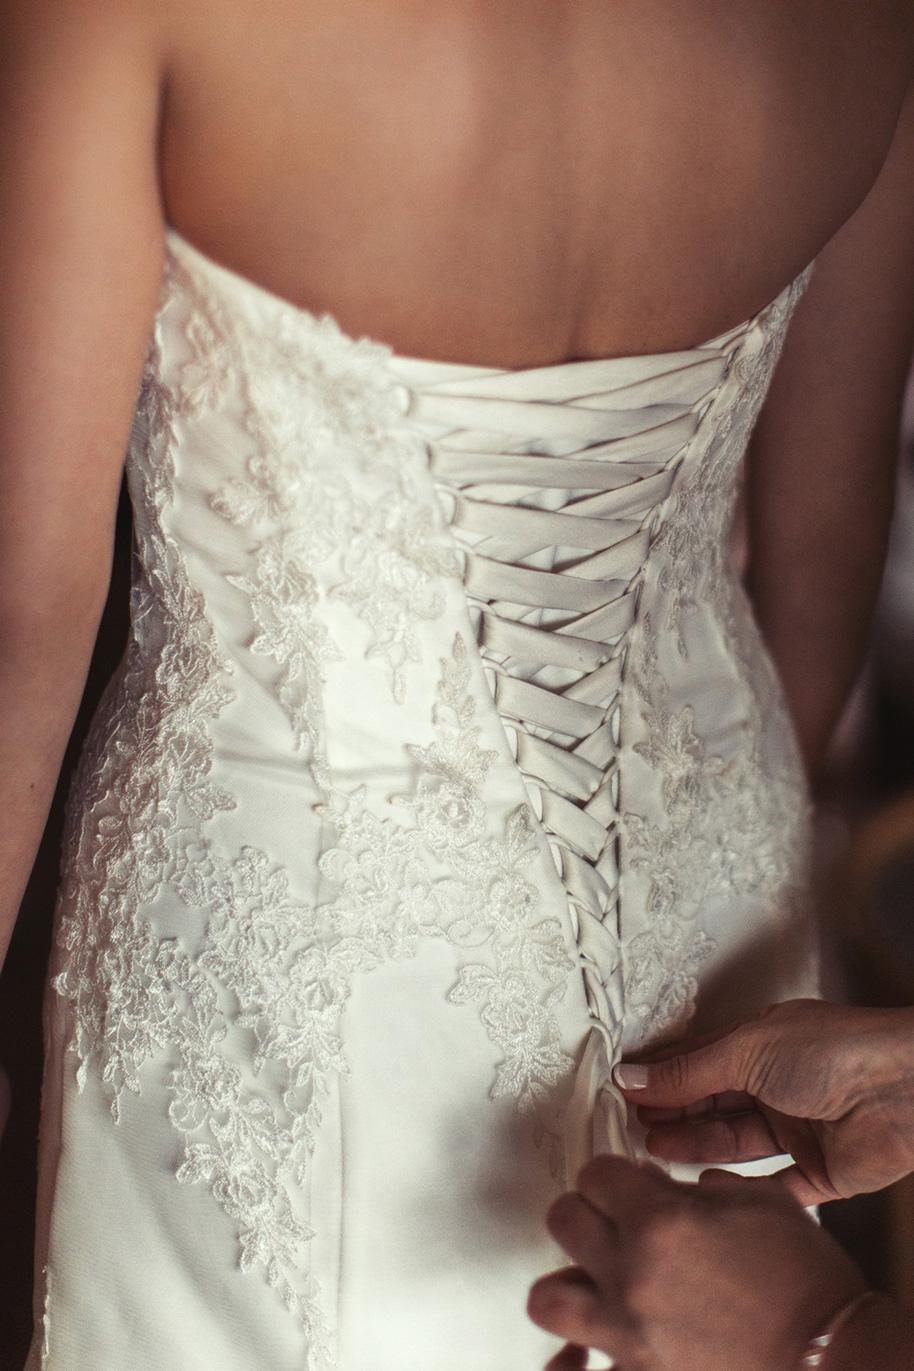 Maui-Ocean-Front-Wedding-070816-4